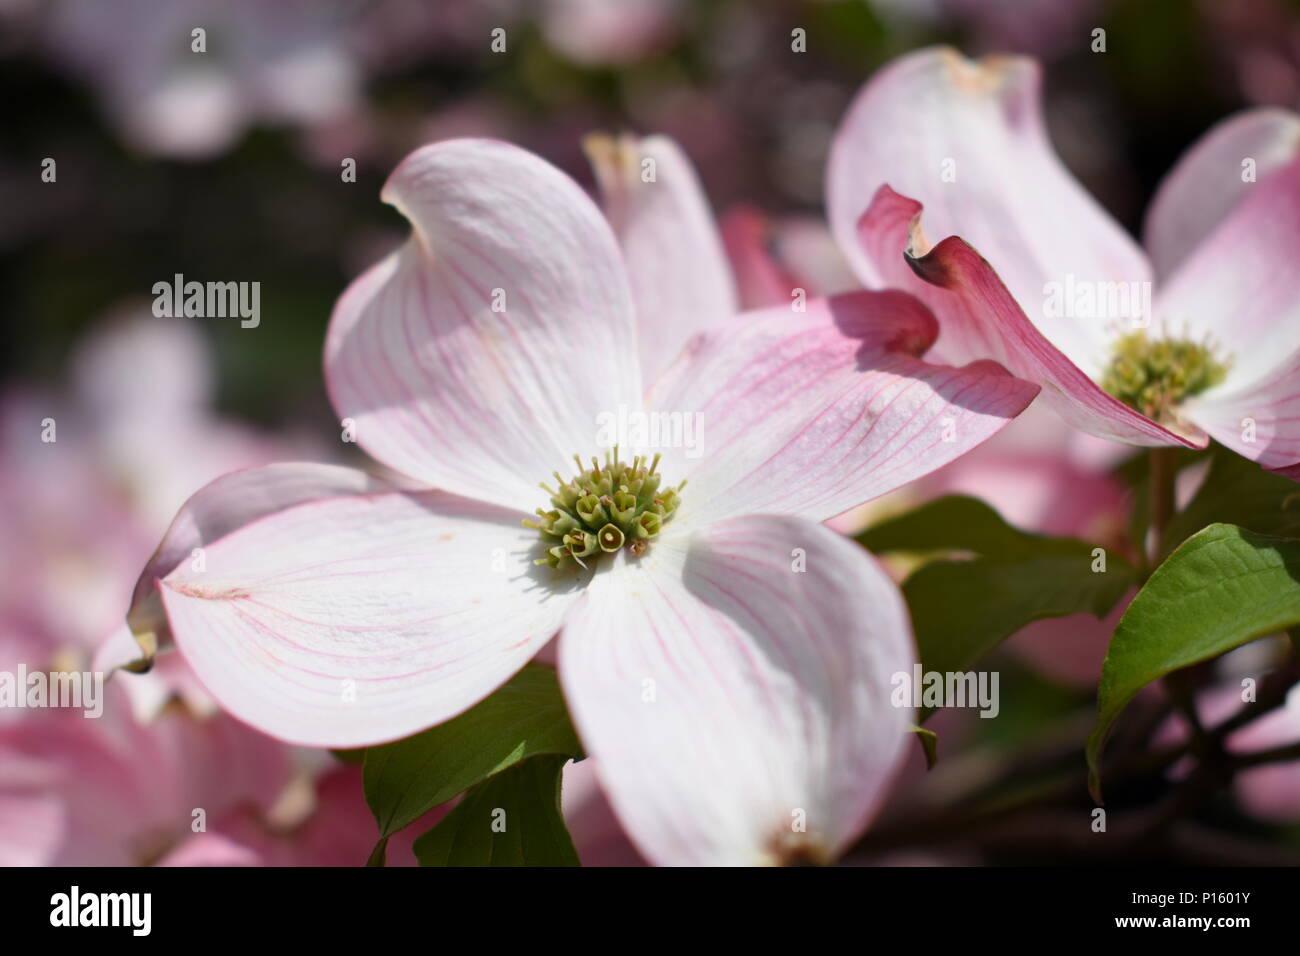 Pink Dogwood Flower Stock Photo 207270839 Alamy